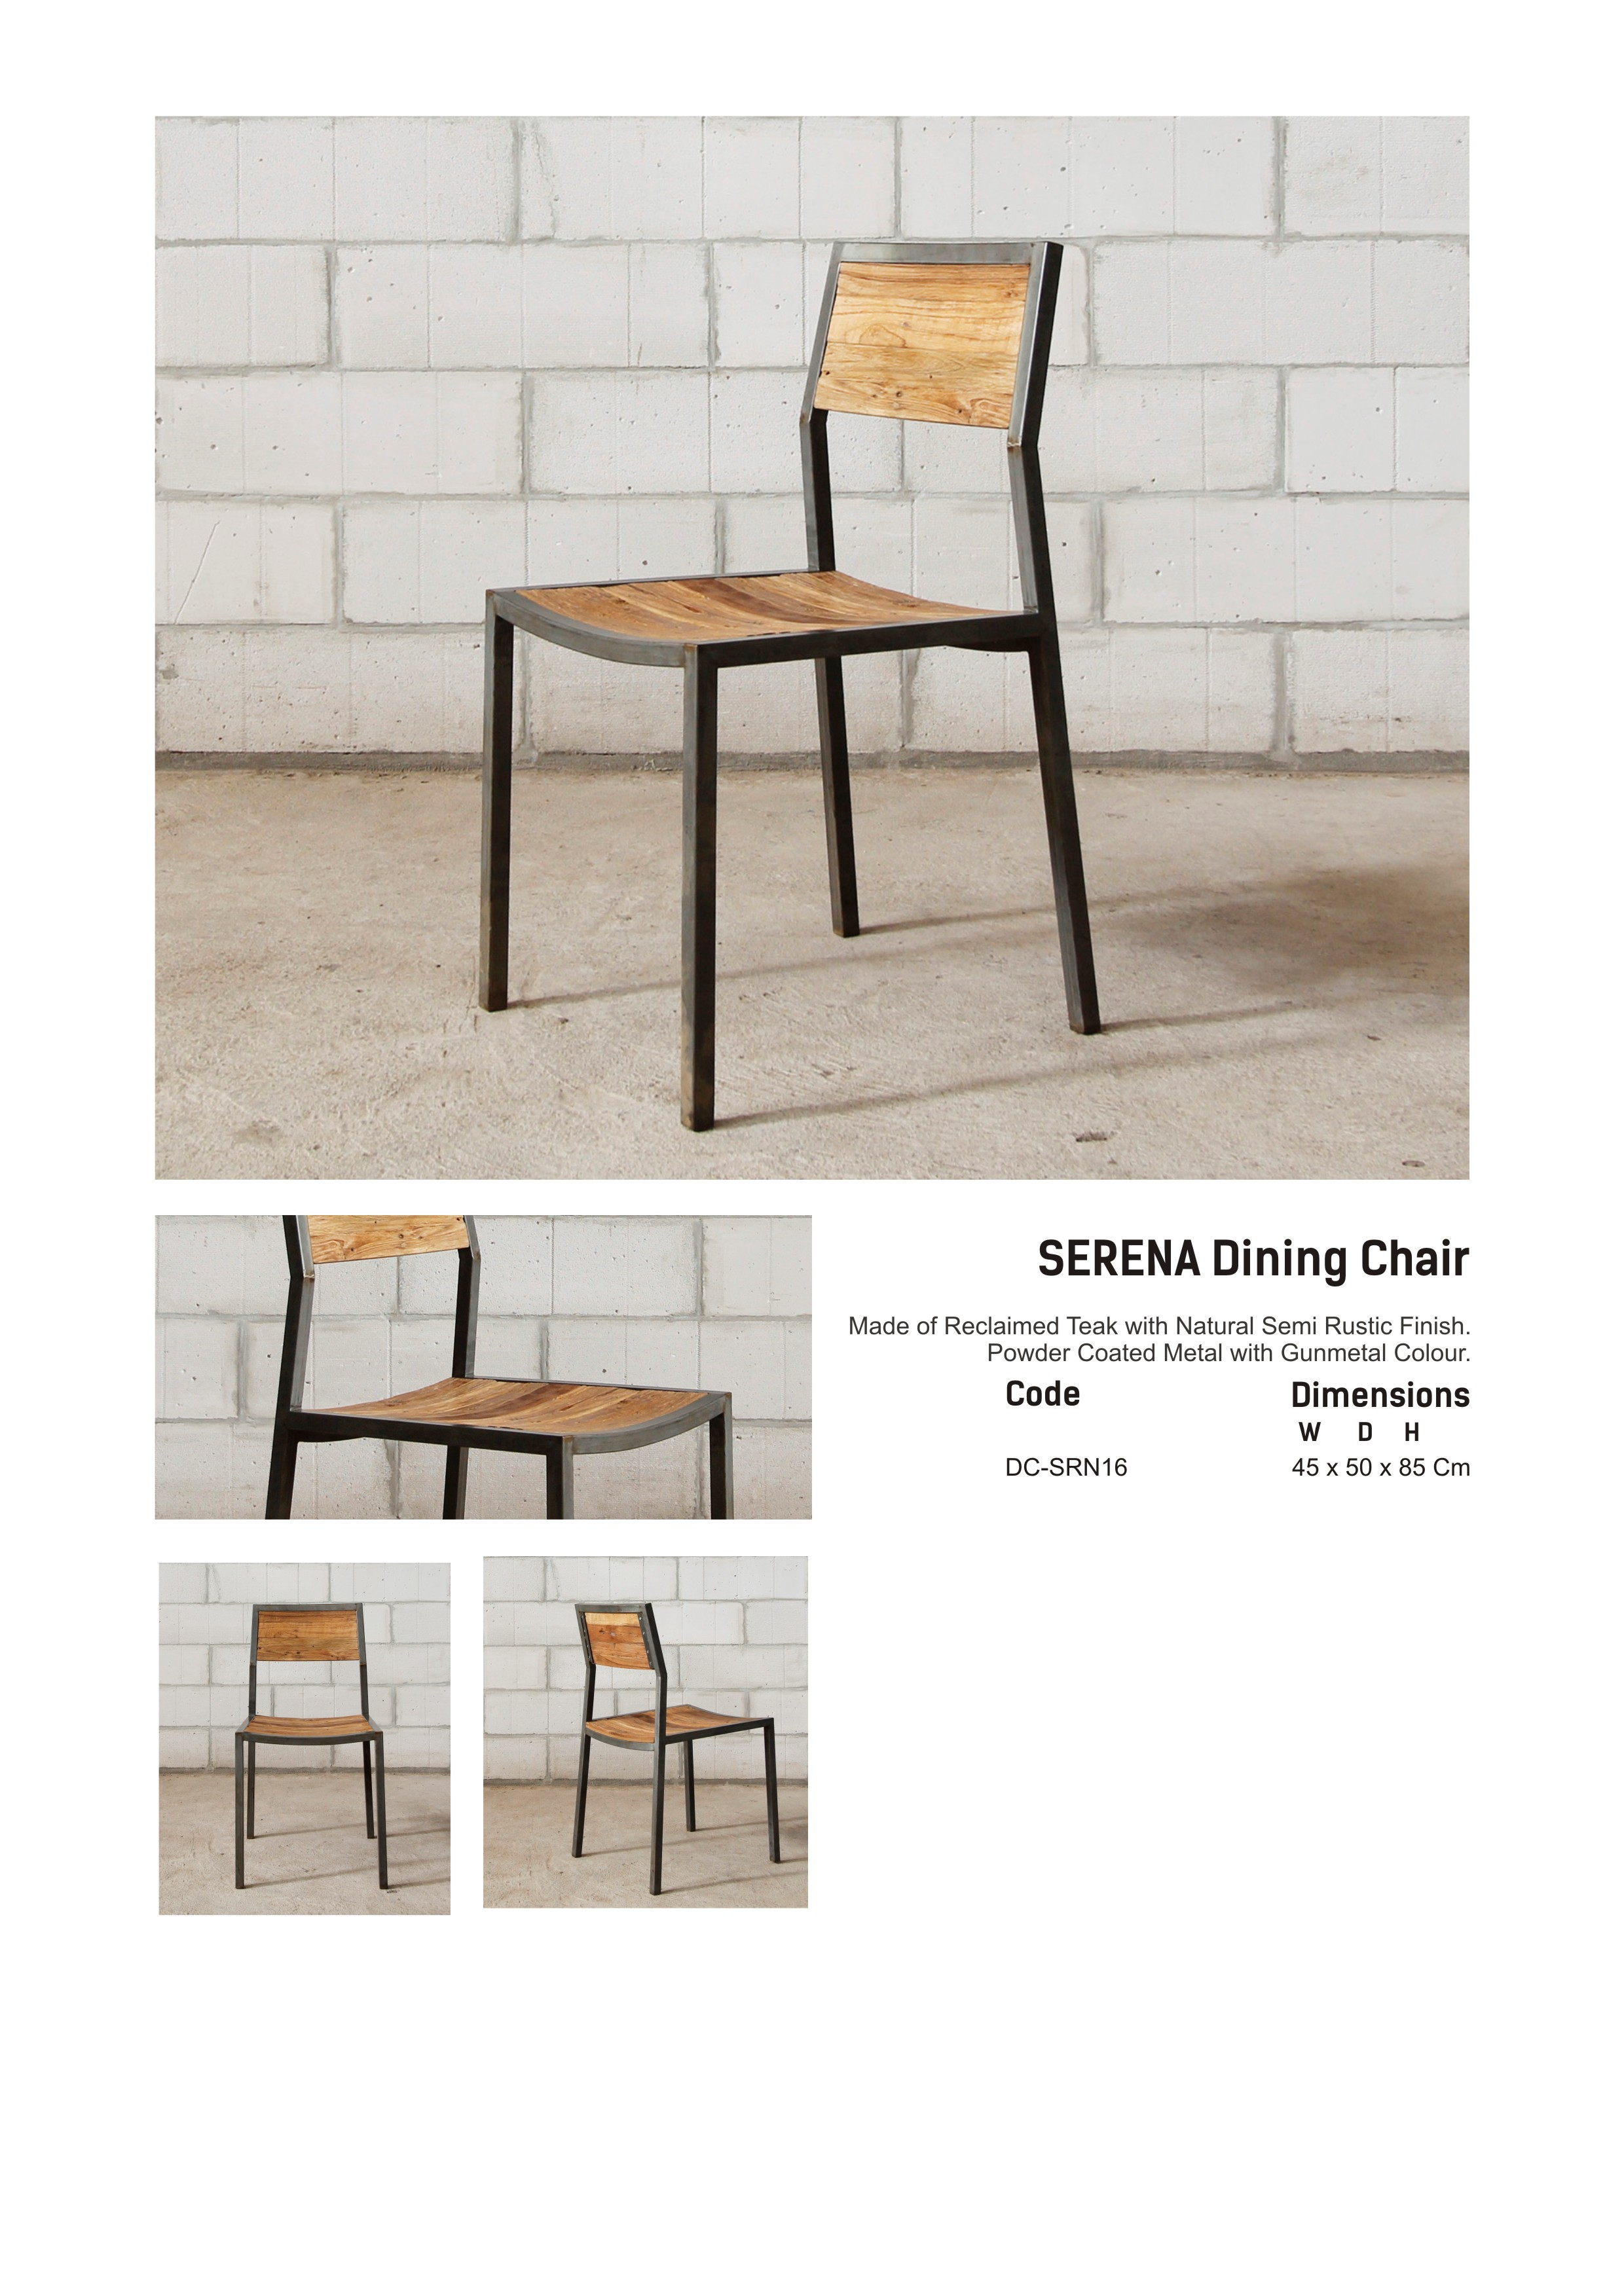 16. SERENA - Dinning Chair